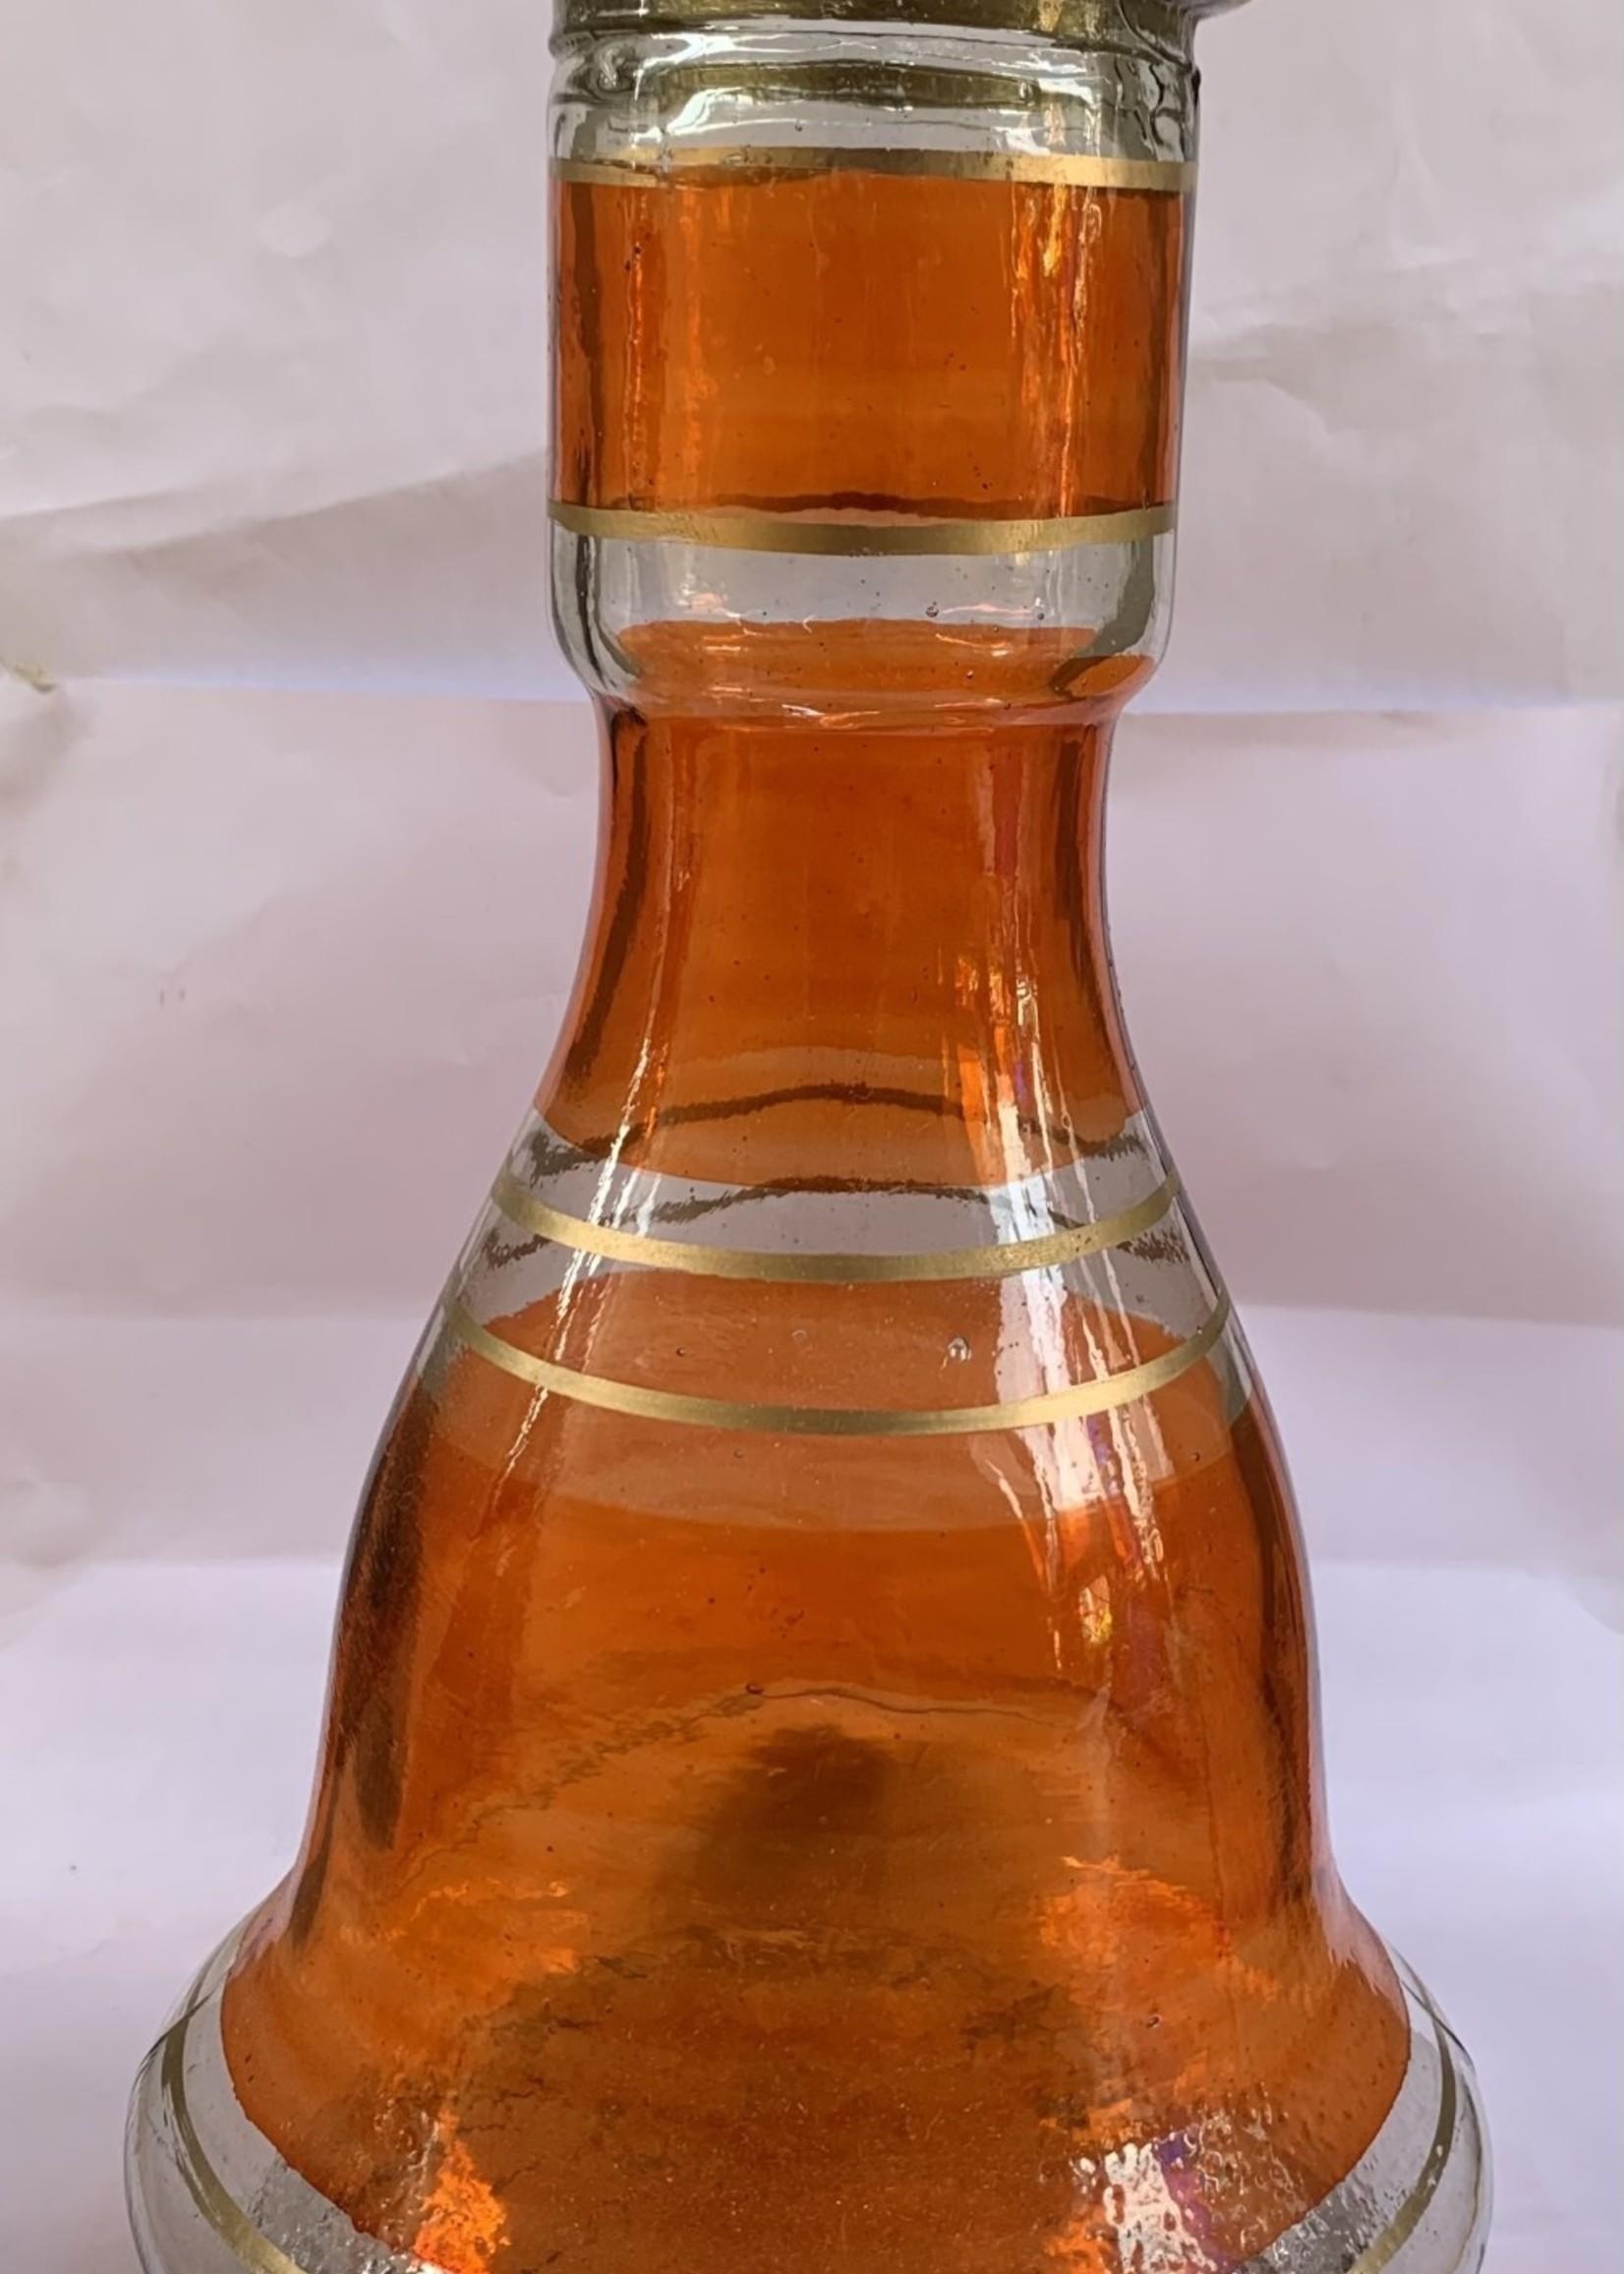 Base - Medium orange